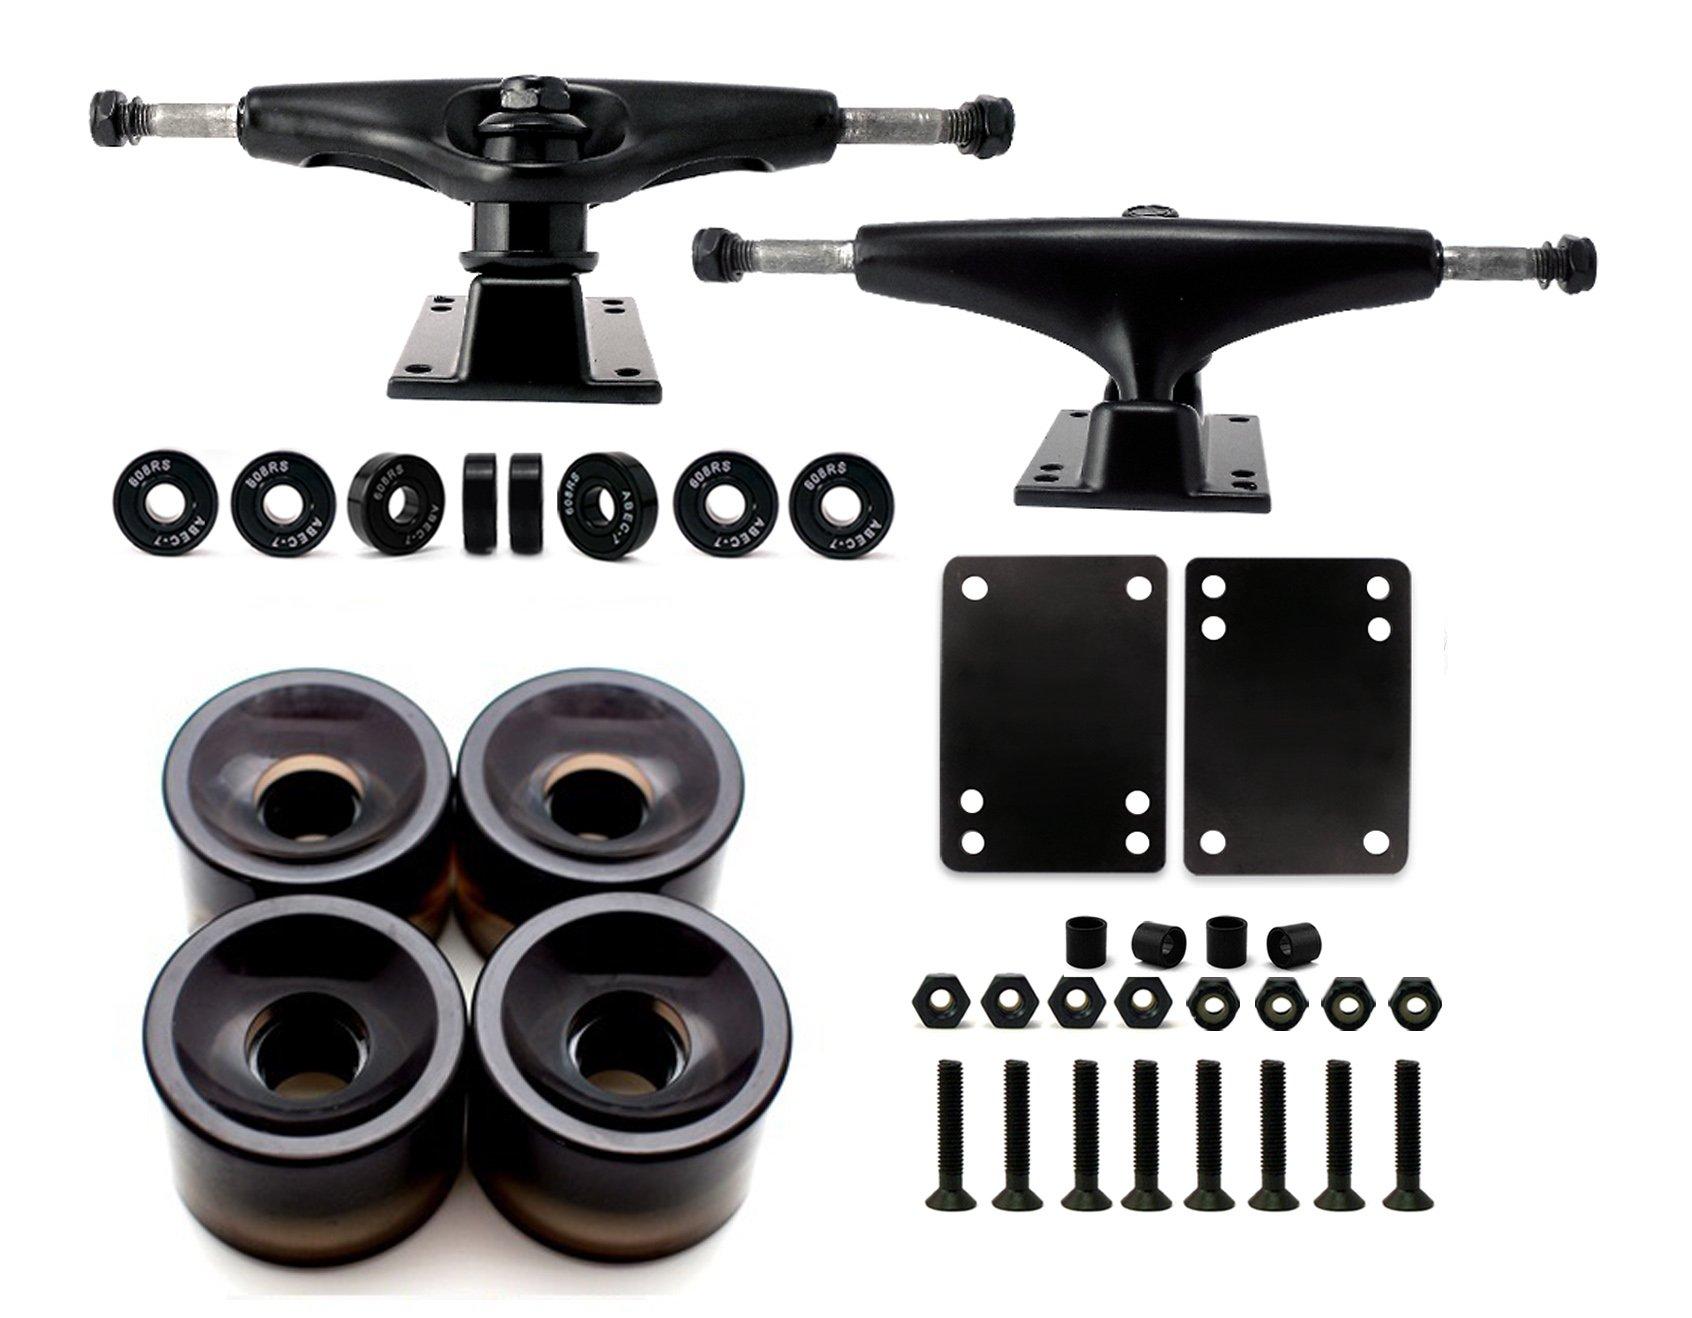 VJ Skateboard Truck and Wheel, 5.0 Skateboard Trucks (Black) w/Skateboard Crusier Wheel 60mm, Skateboard Bearings, Skateboard Screws, Skateboard Riser Pads (Gel Black) by VJ